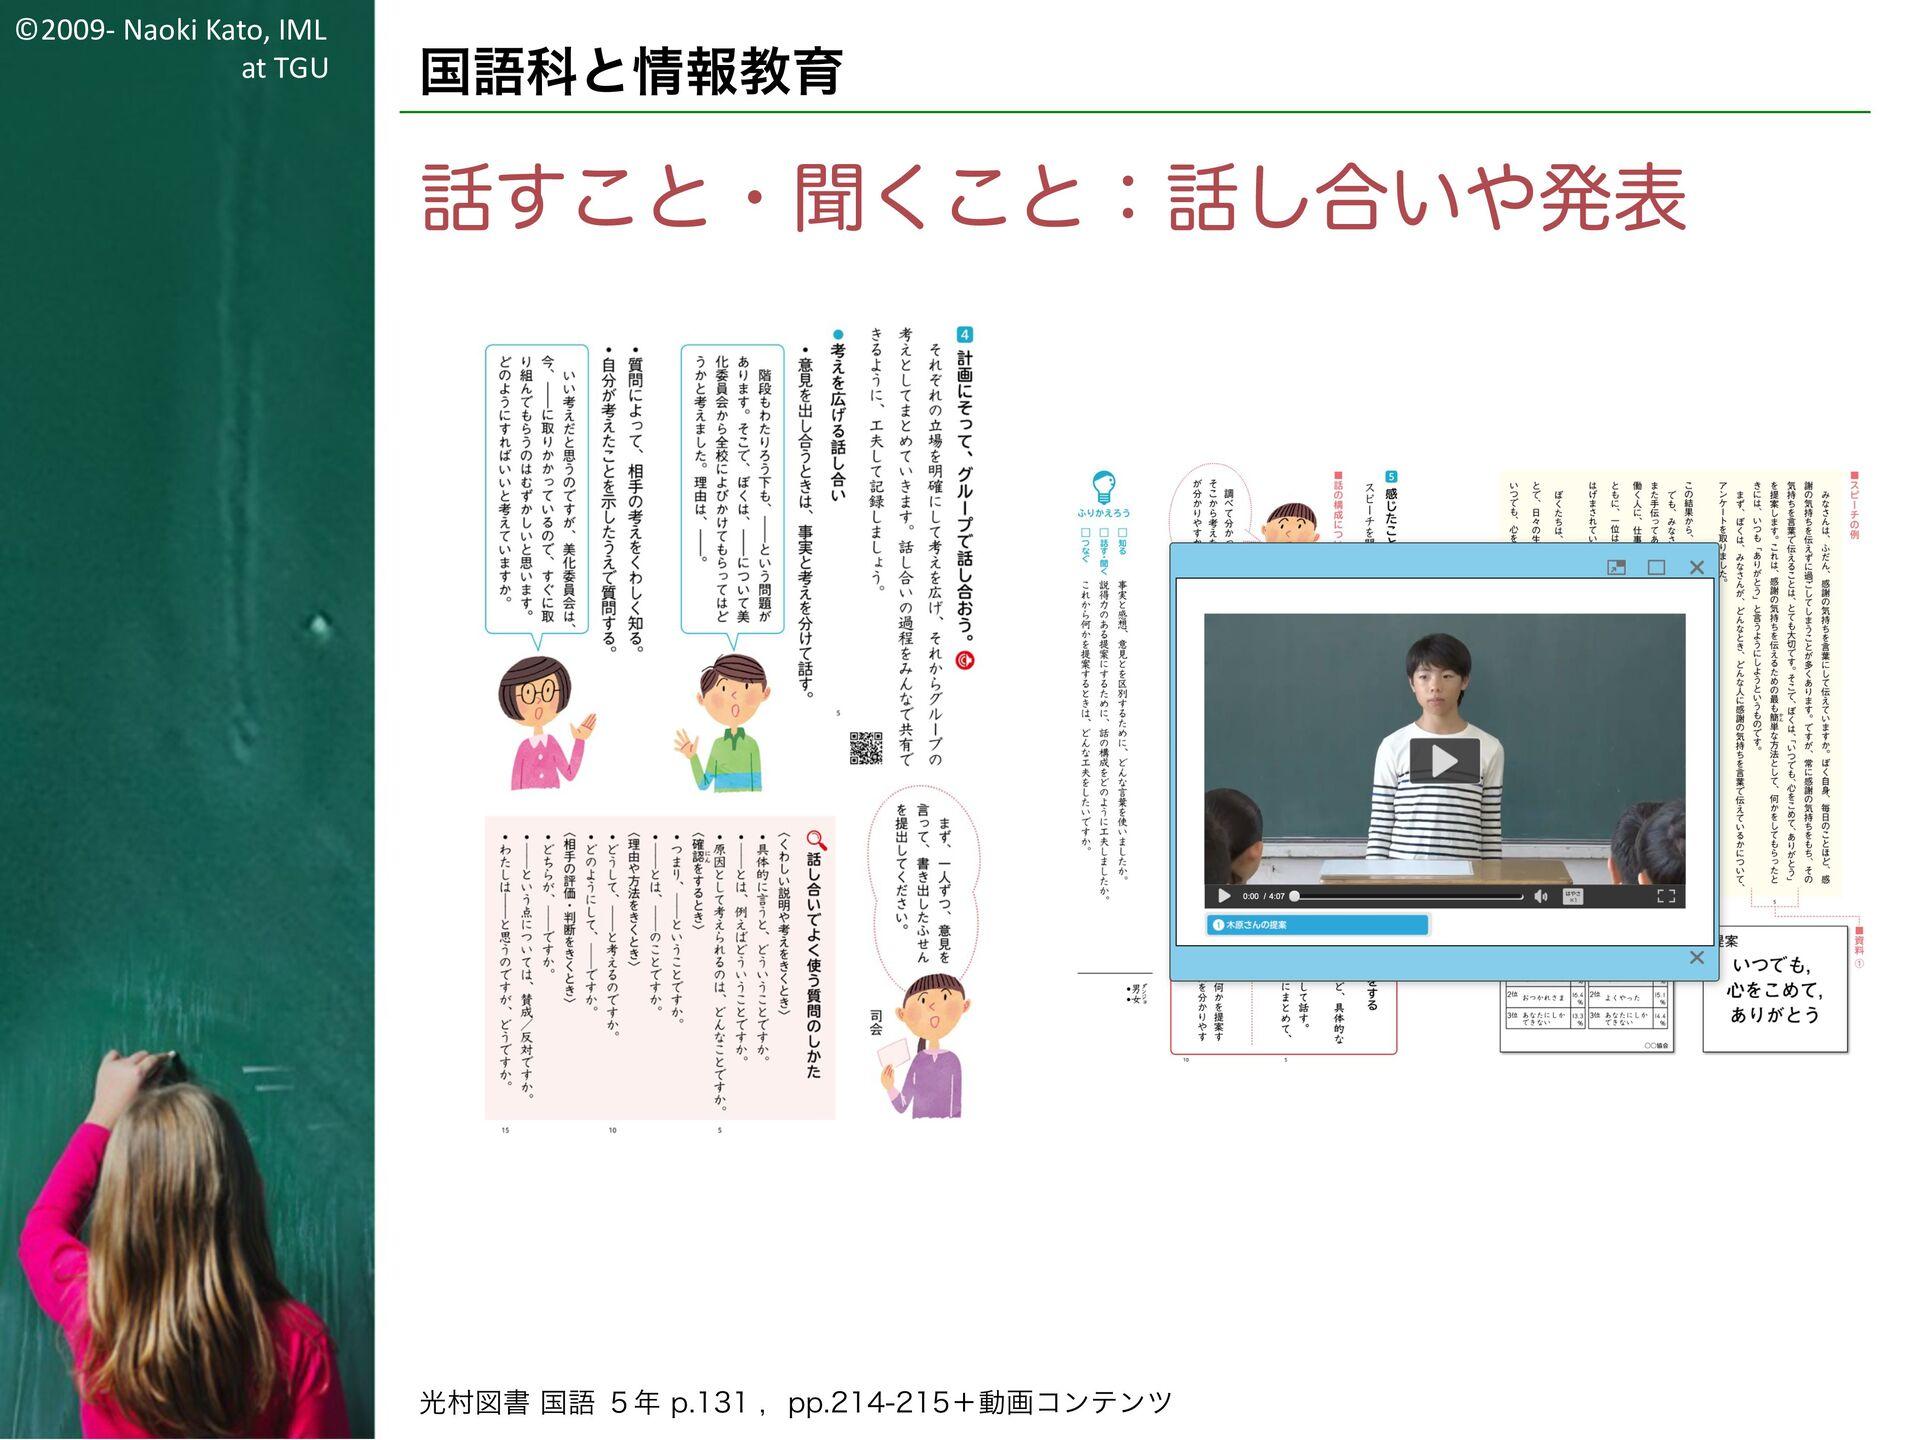 ©2009- Naoki Kato, IML at TGU 小学校における プログラミング教育...